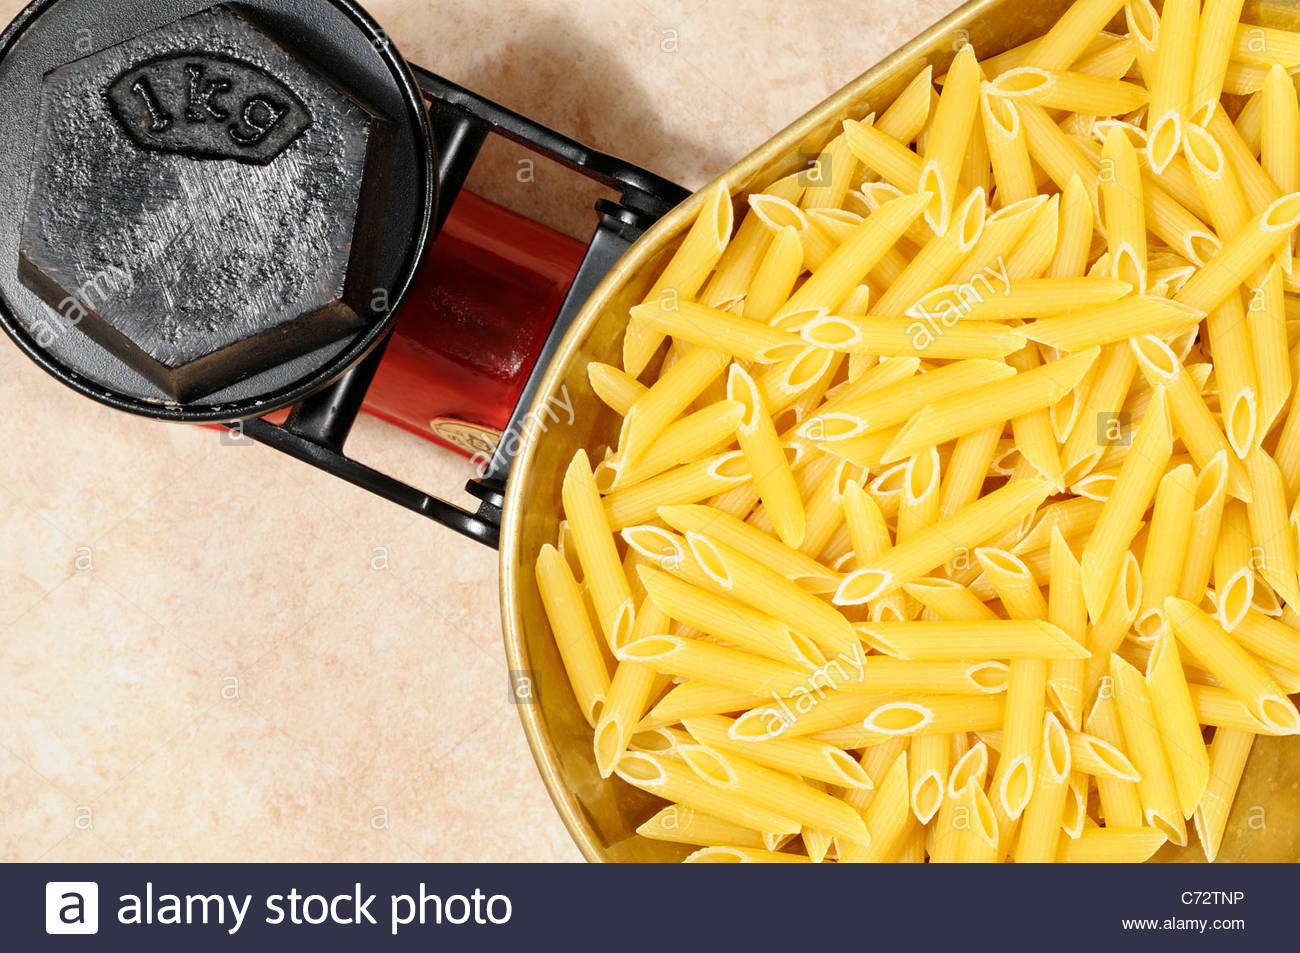 Dry pasta on Kitchen scales 1kg, England Stock Photo